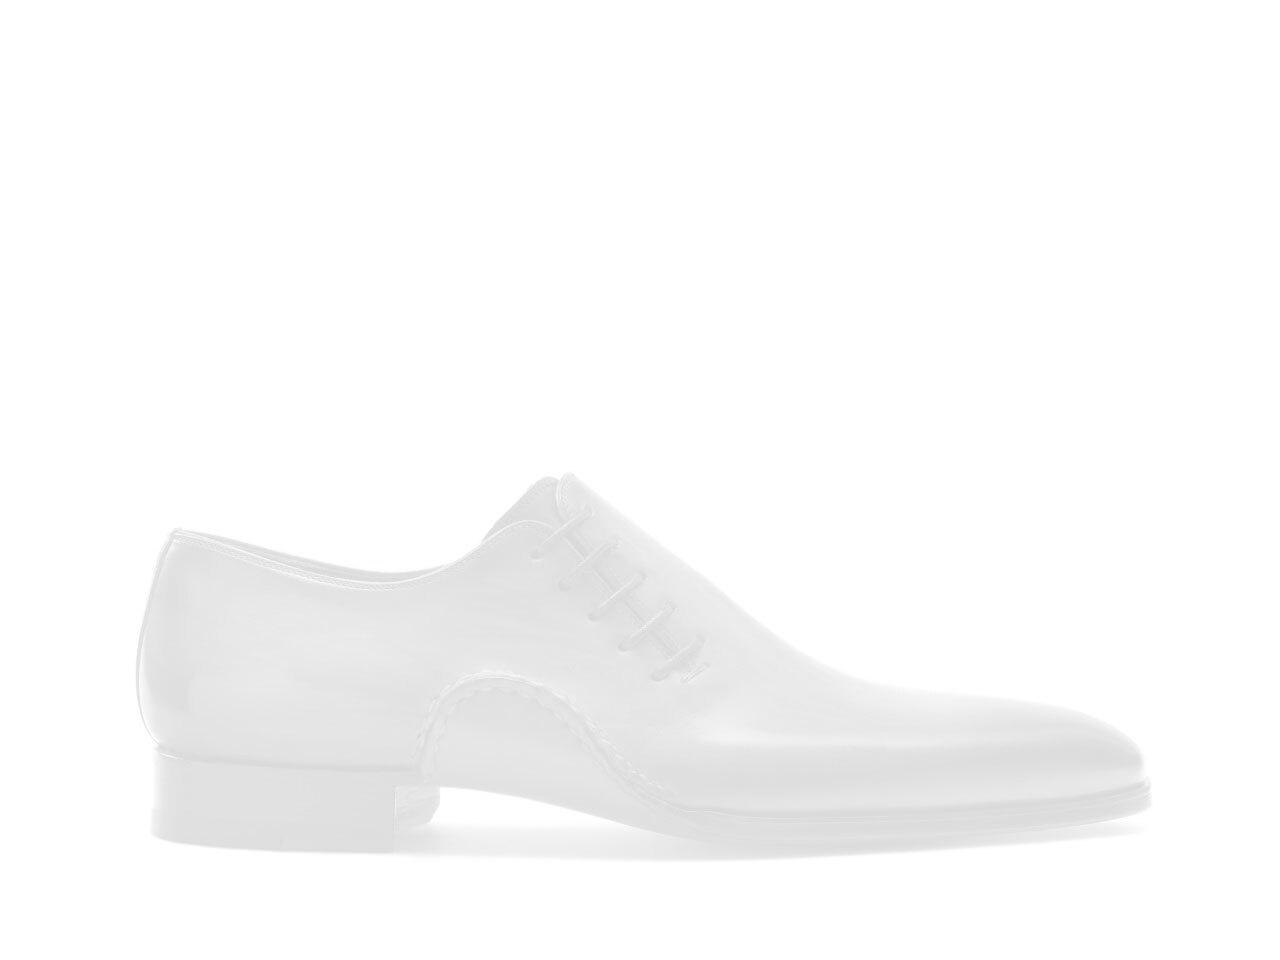 Pair of the Magnanni Basilio Lo White Men's Sneakers